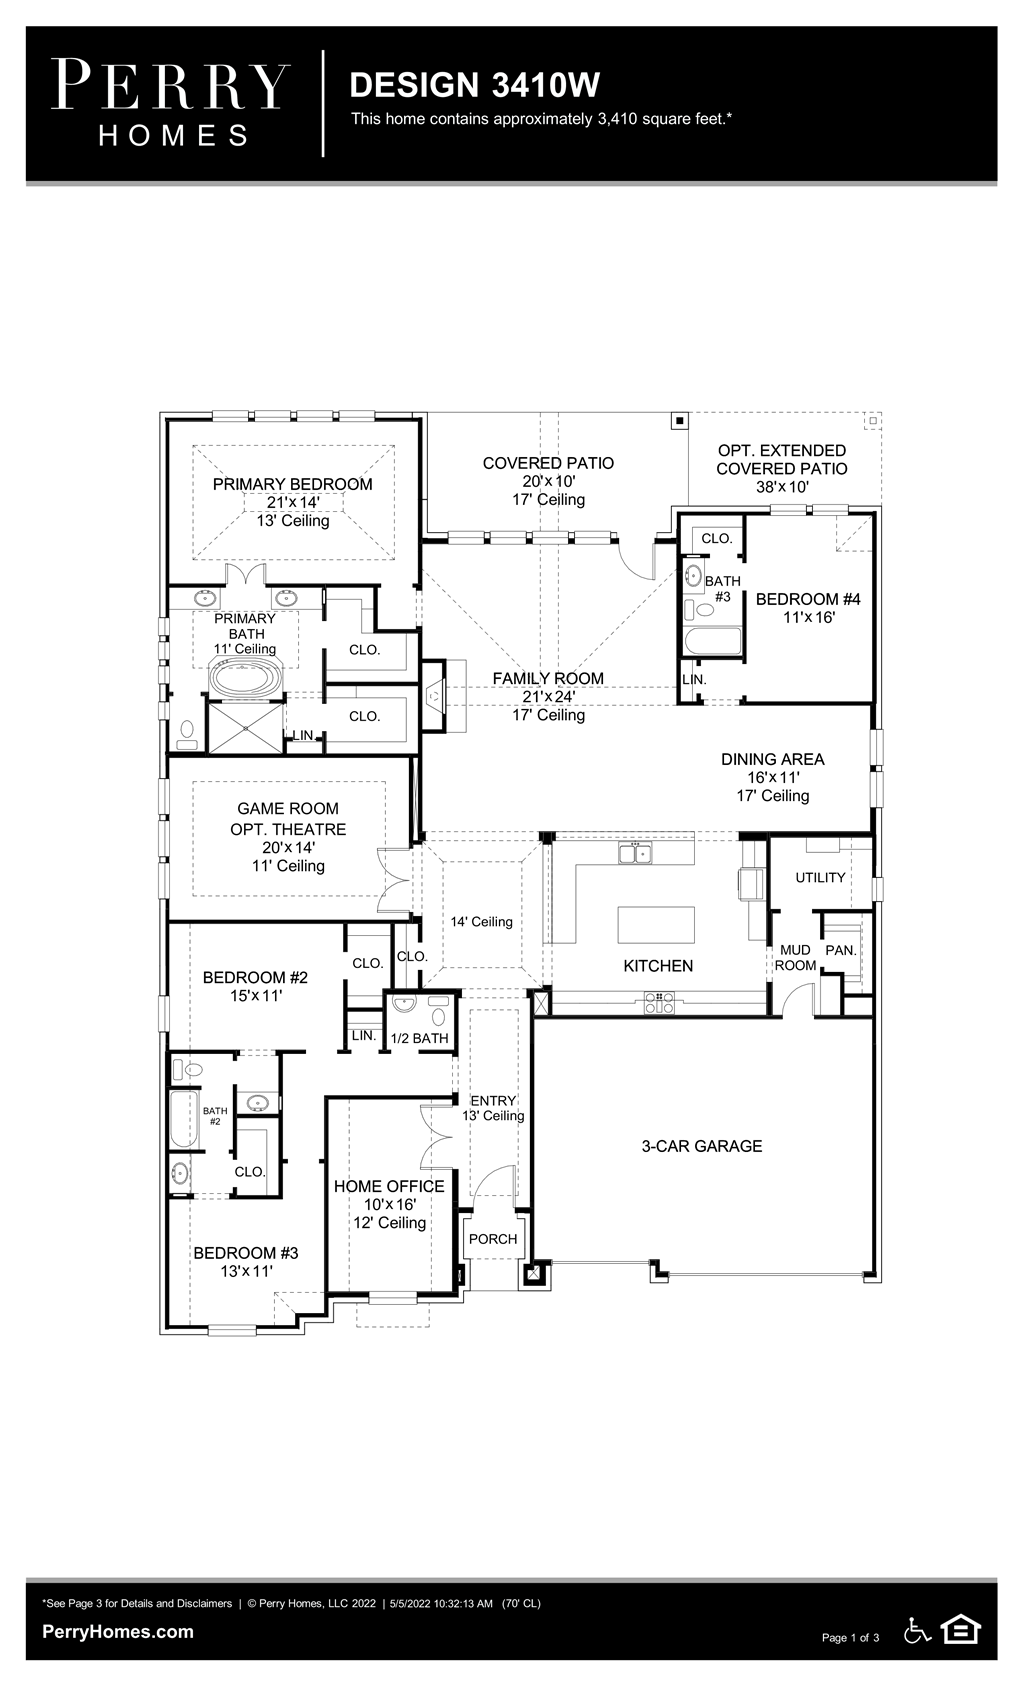 Floor Plan for 3410W